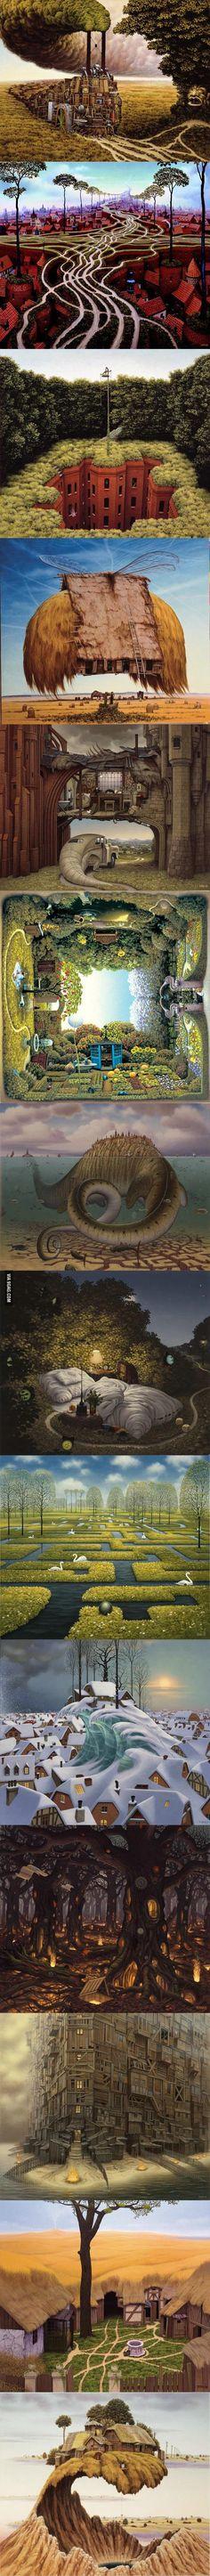 Some very interesting drawings by Jacek Yerka